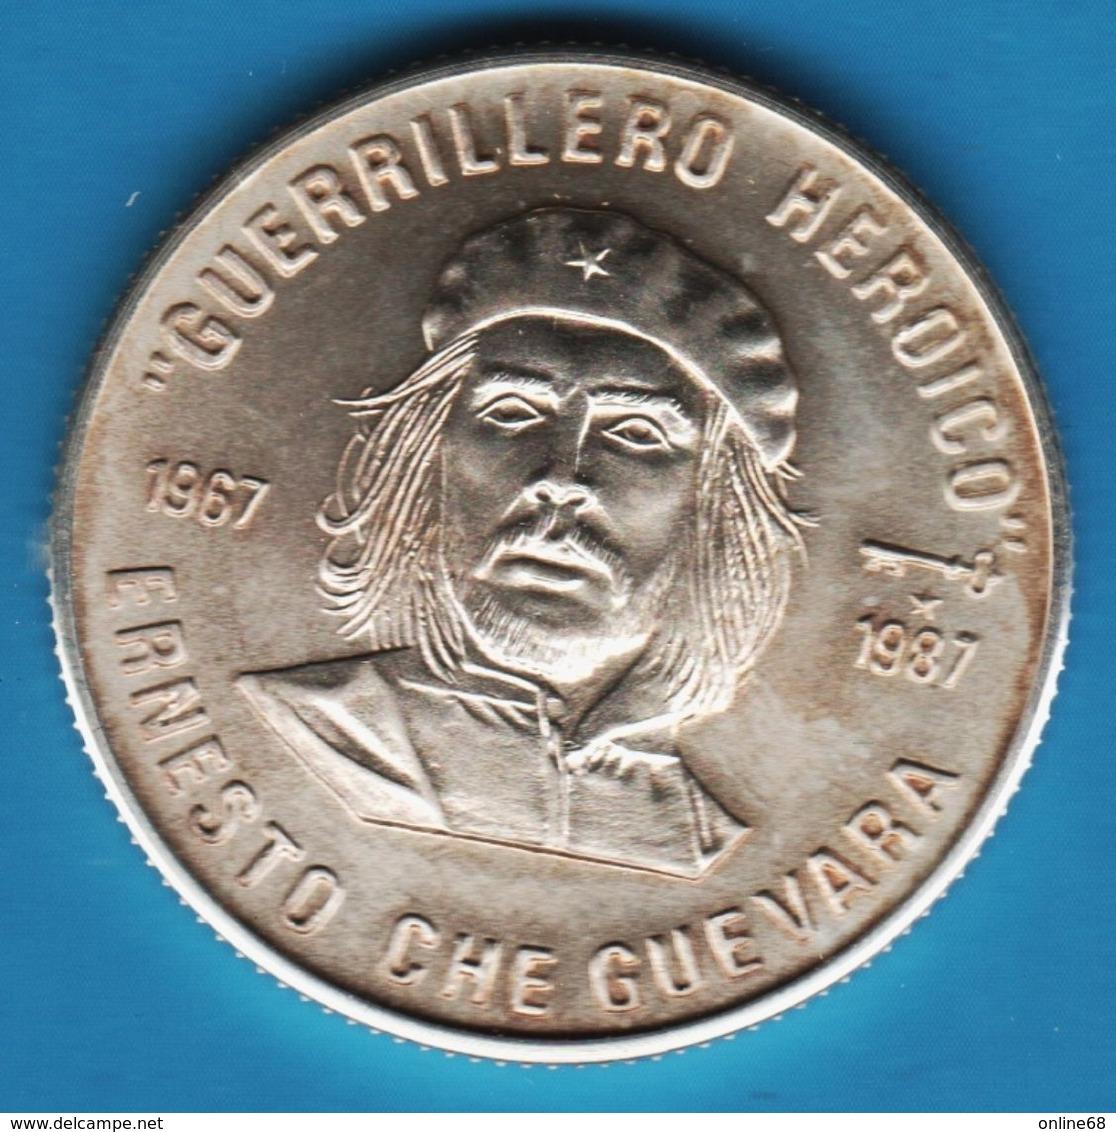 CUBA 5 Pesos 1987 ERNESTO CHE GUEVARA ARGENT Silver 0.999  SCARCE !!! - Cuba